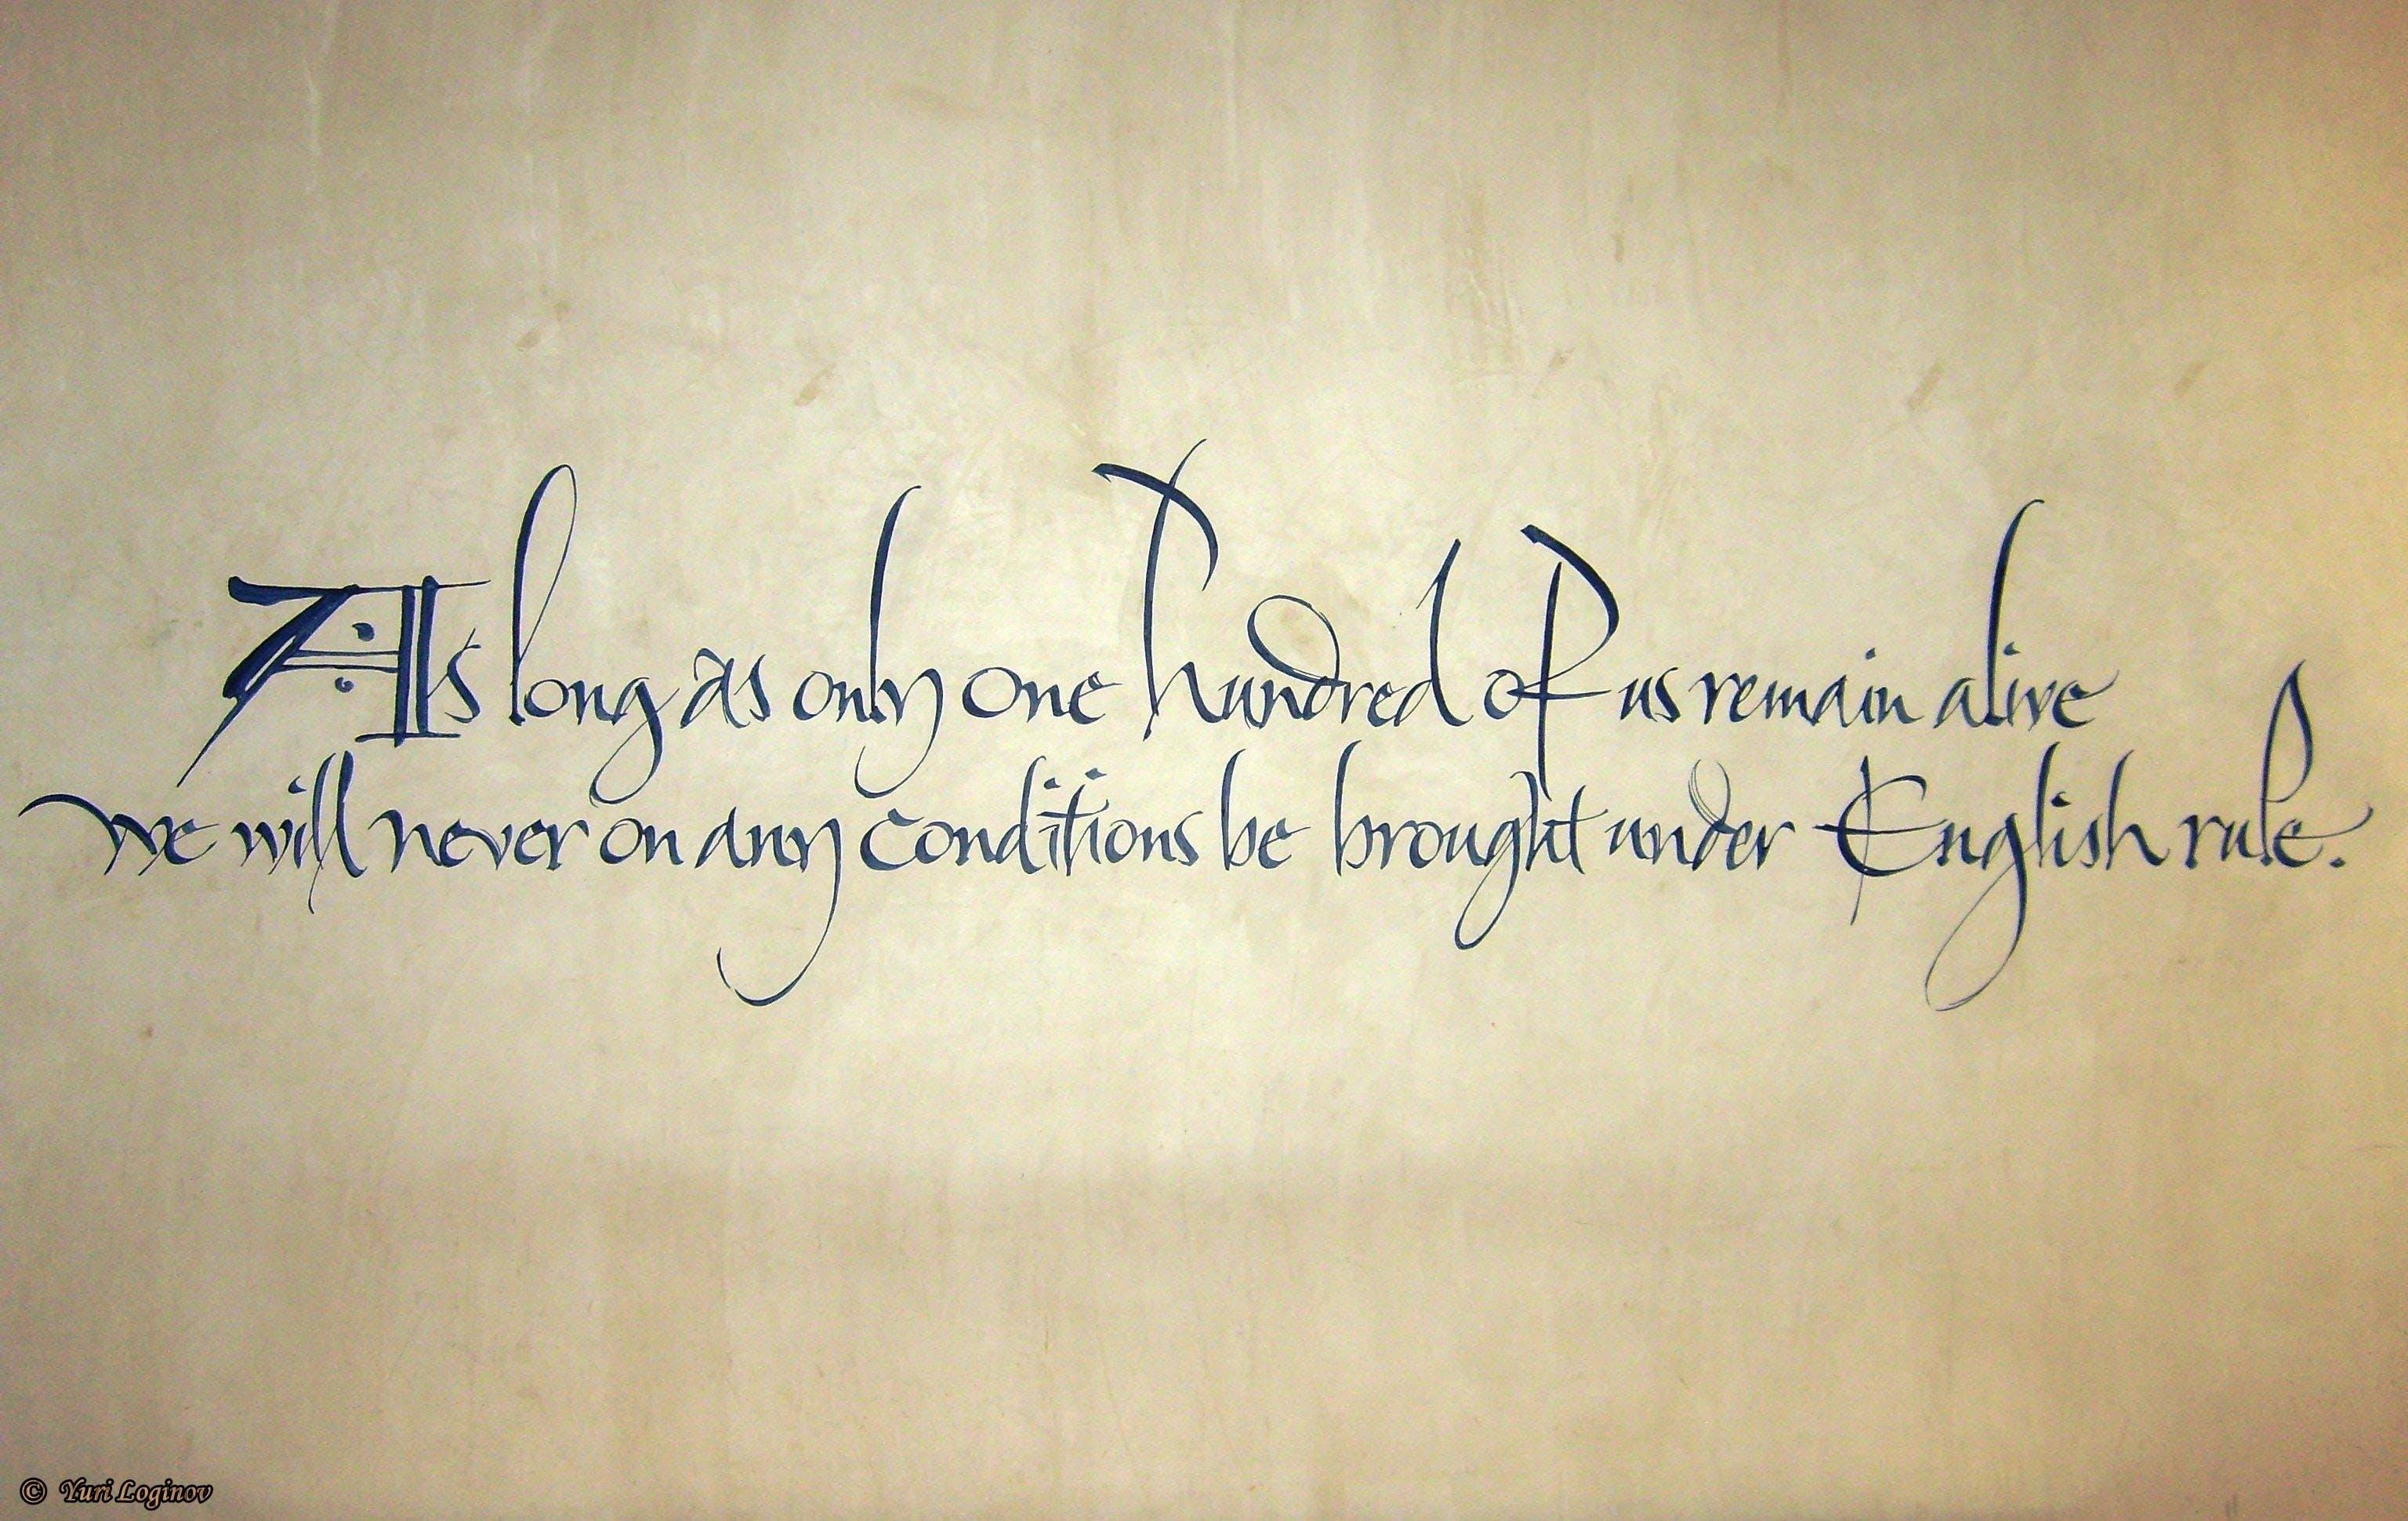 Free stock photo of scotland, edinburgh, united kingdom, National Museum of Scotland